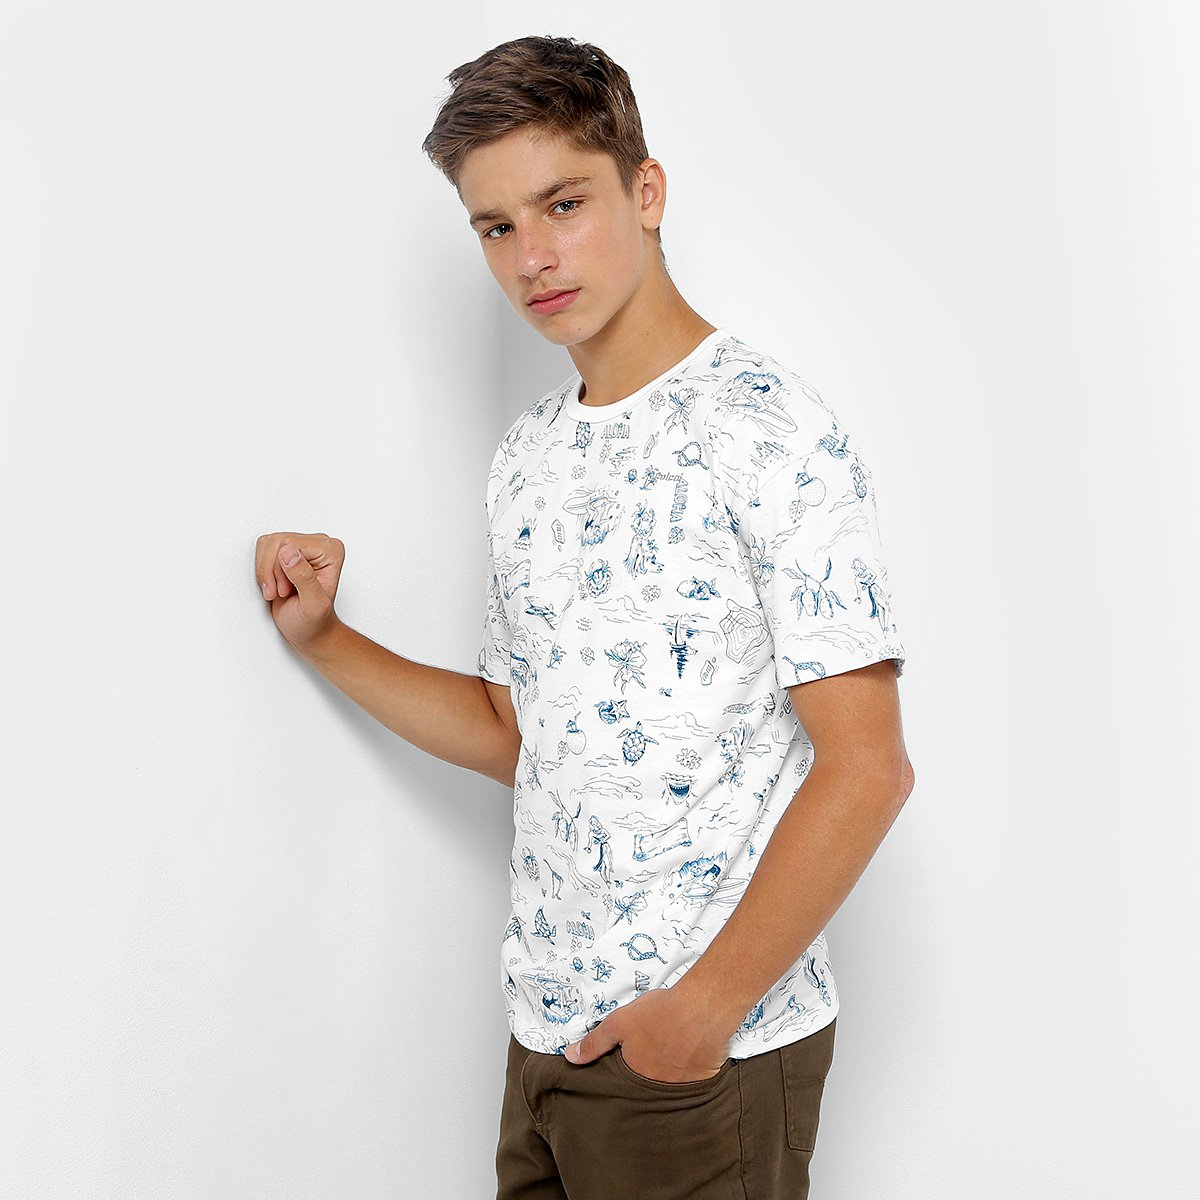 2a0a96b30 Camiseta Infantil Colcci Fun Aloha Masculina - Shopping TudoAzul